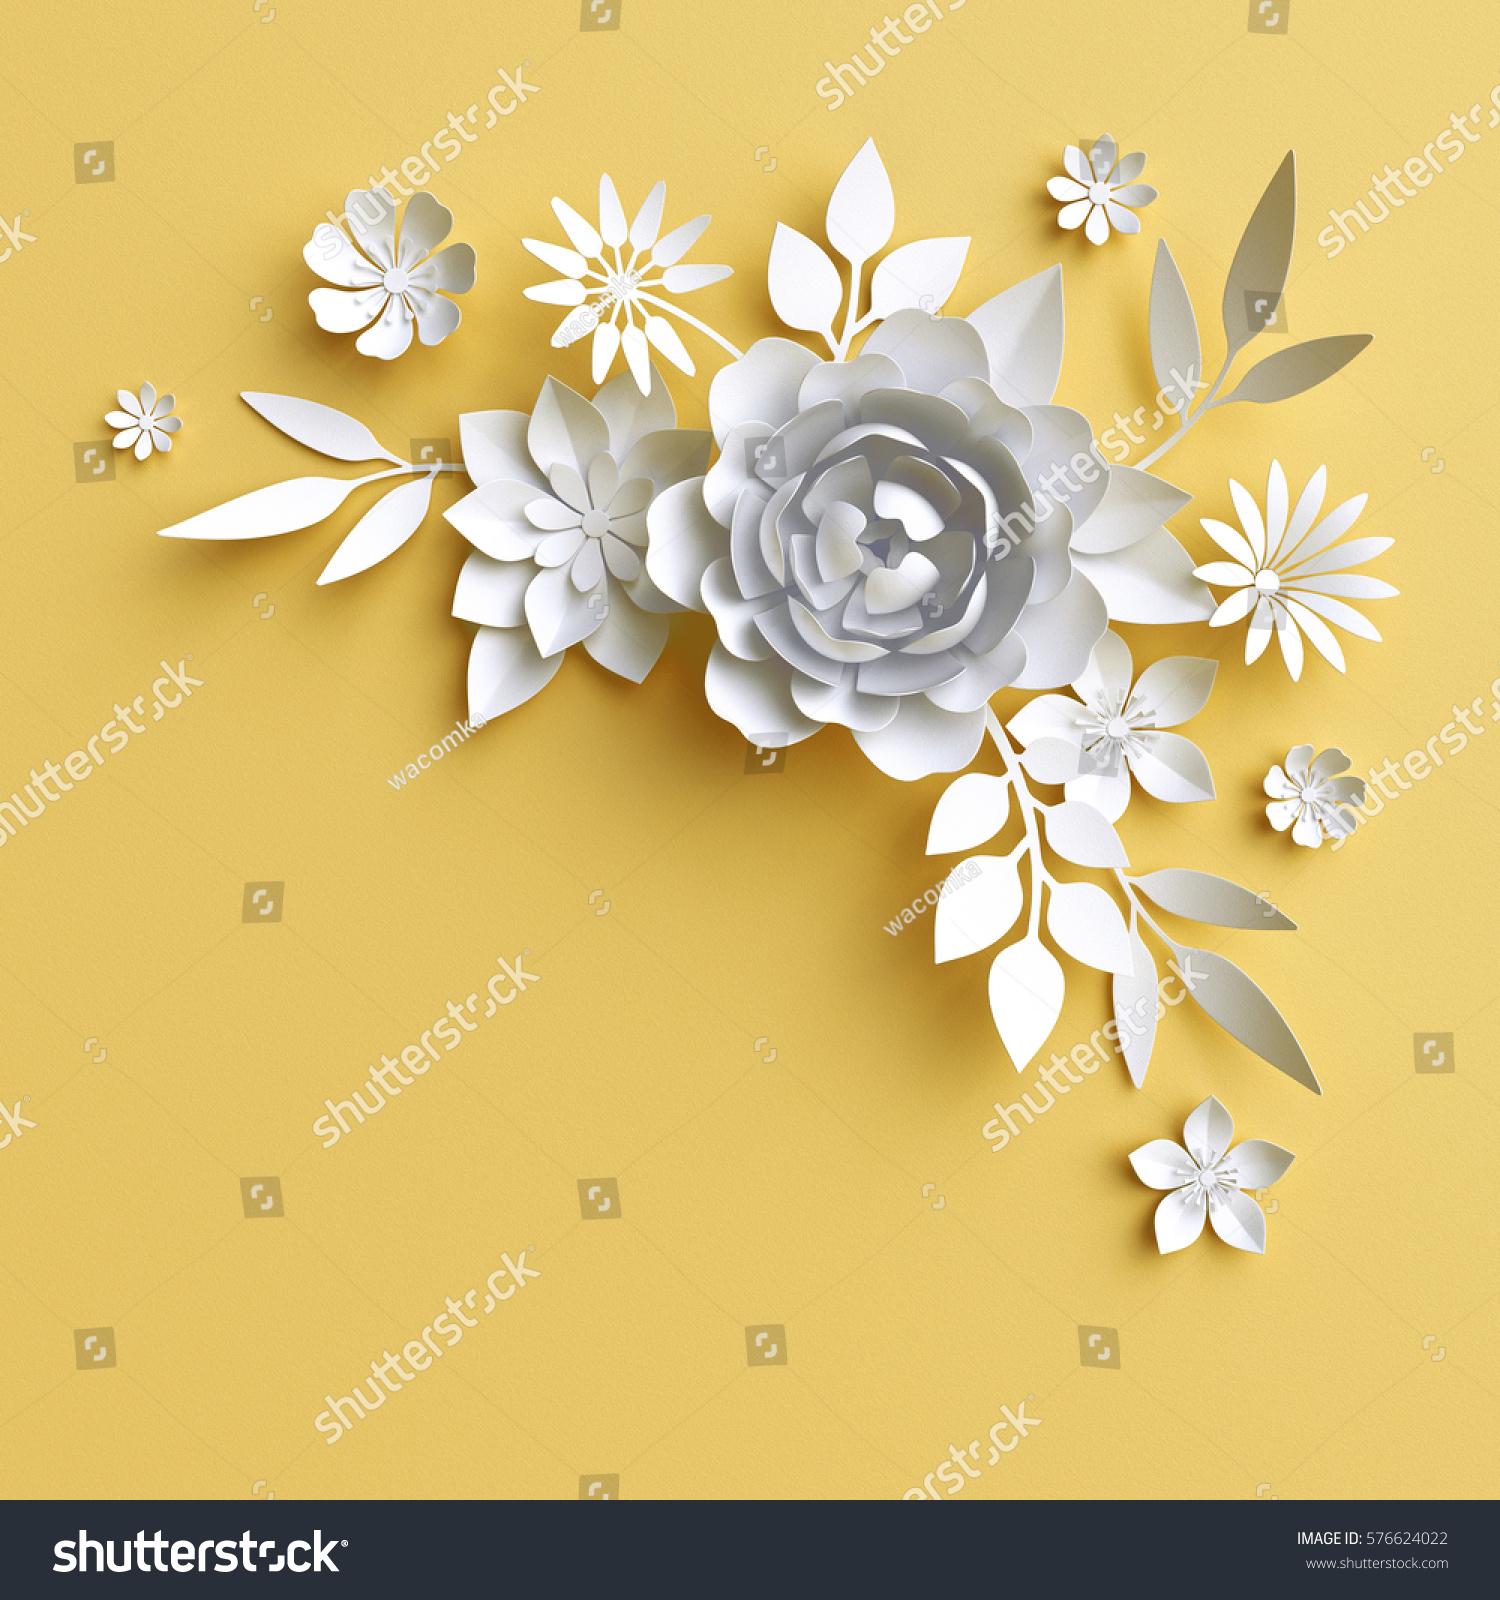 3d Render Digital Illustration White Paper Flowers On Yellow